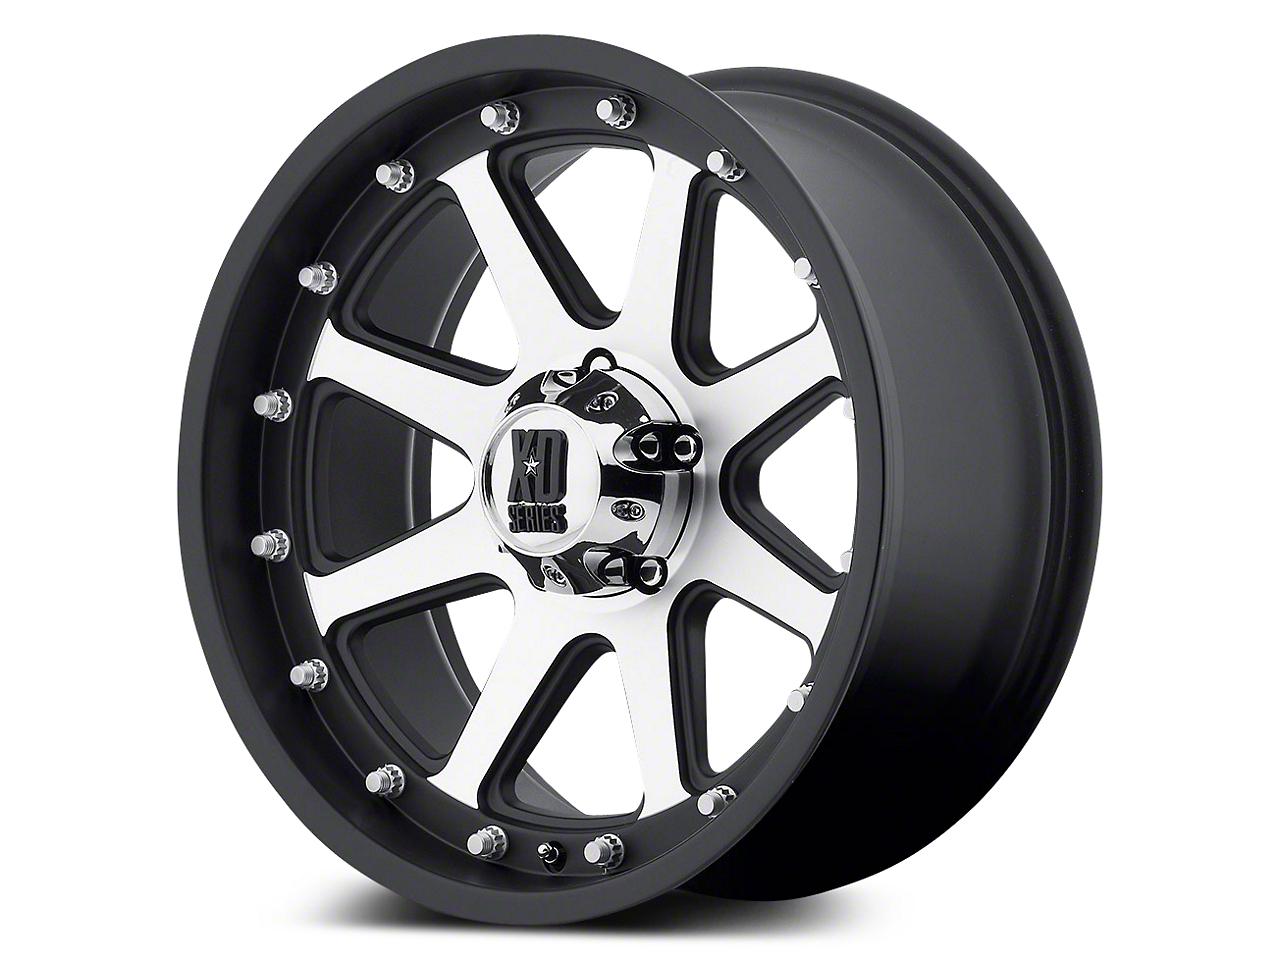 XD Addict Matte Black Machined 5-Lug Wheel - 20x9 (02-18 RAM 1500, Excluding Mega Cab)